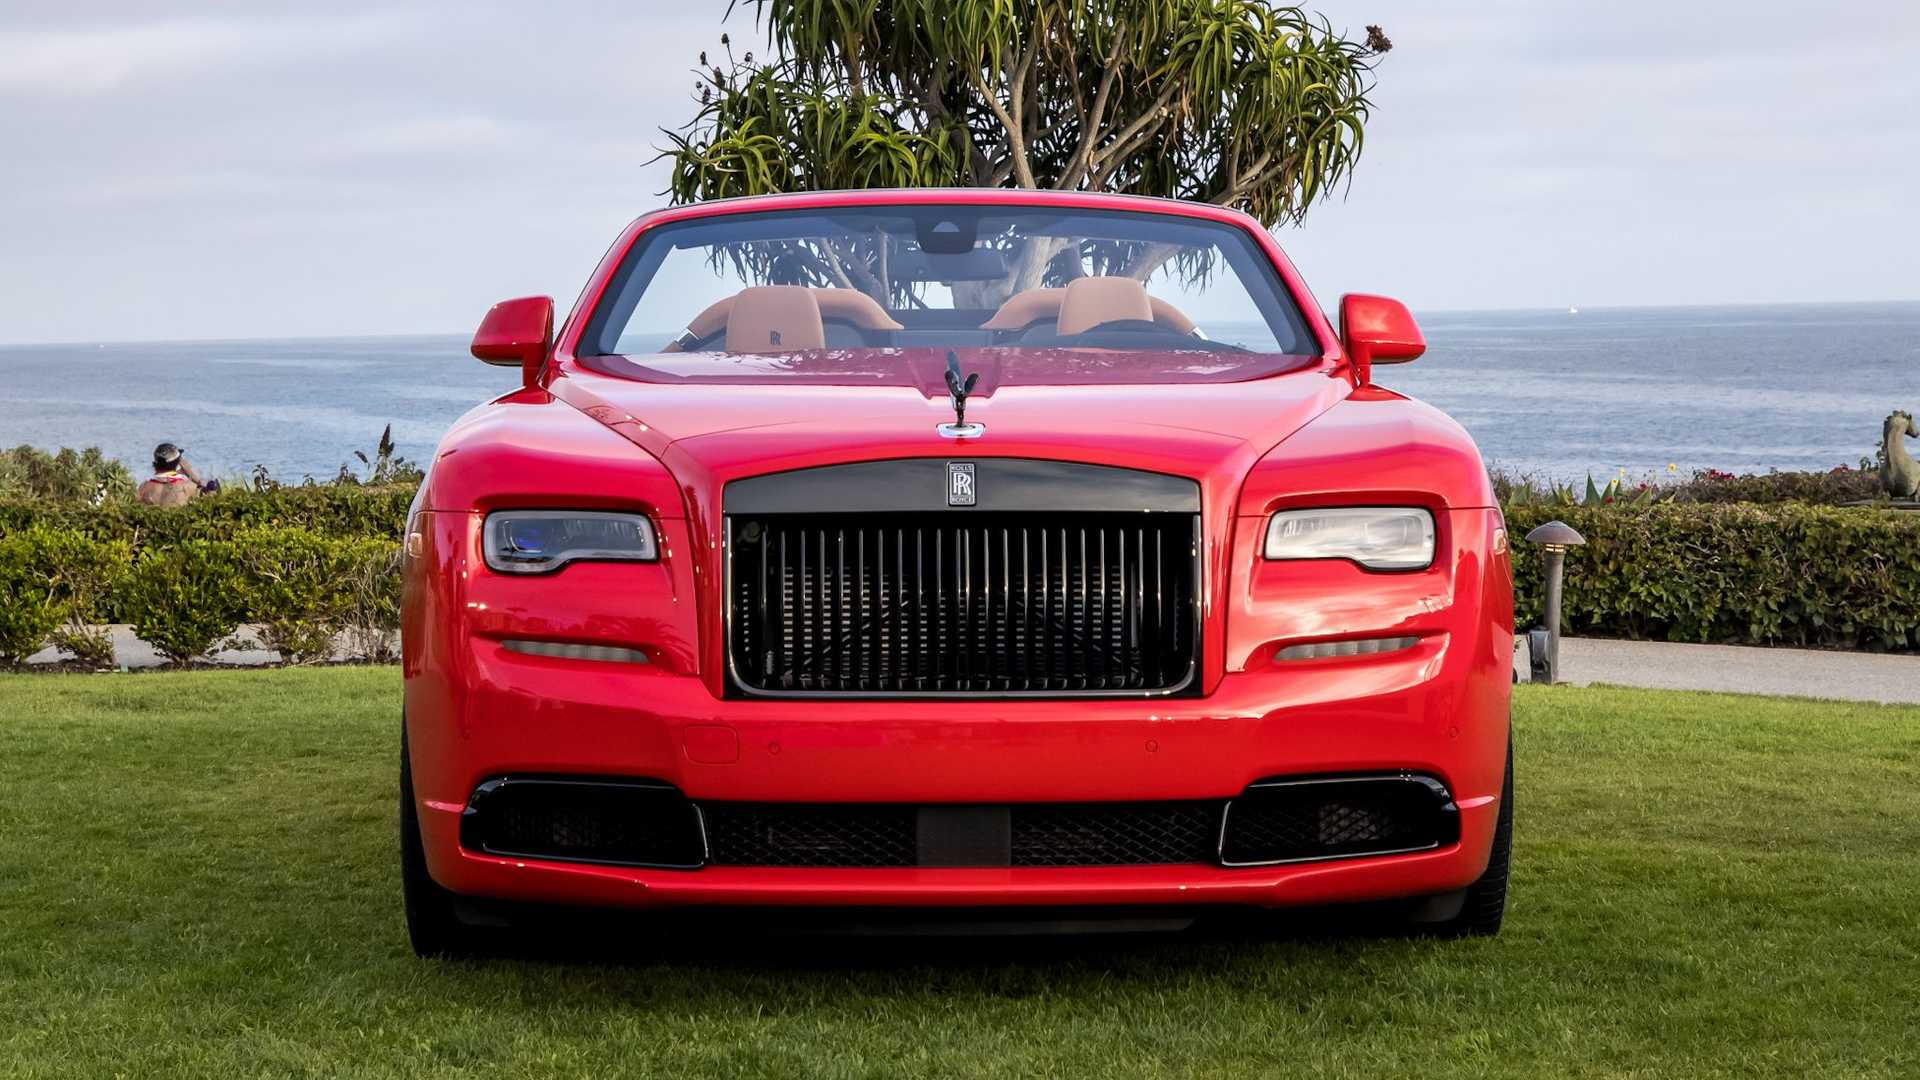 Bespoke-Rolls-Royce-Phantom-and-Dawn-3